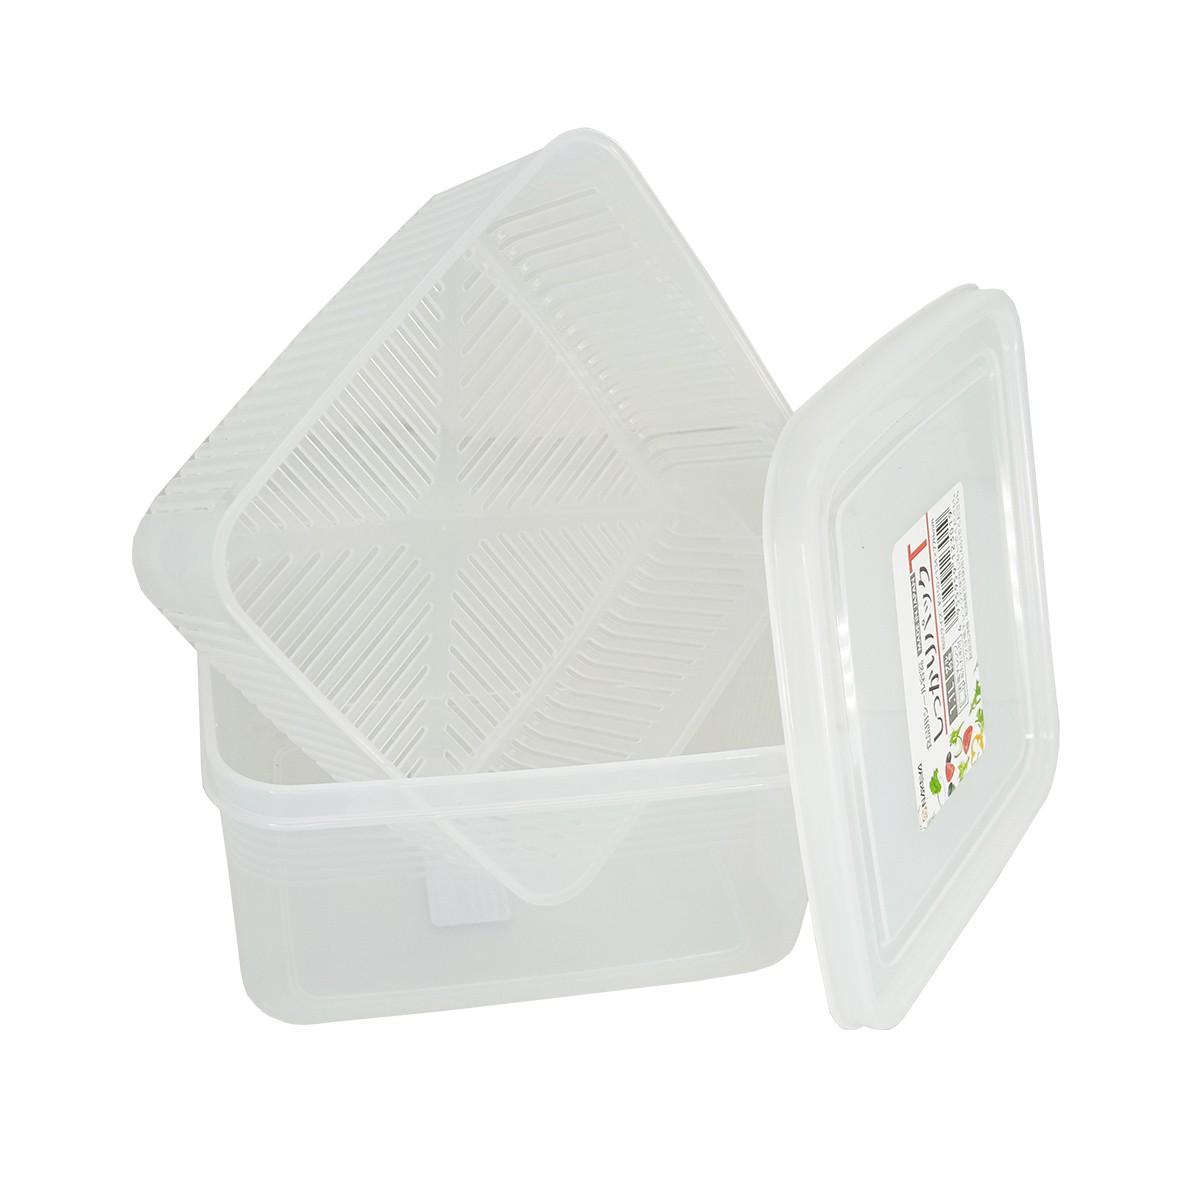 Pote Plástico com Escorredor p/ Queijo Mod. T  K-230 1,1L